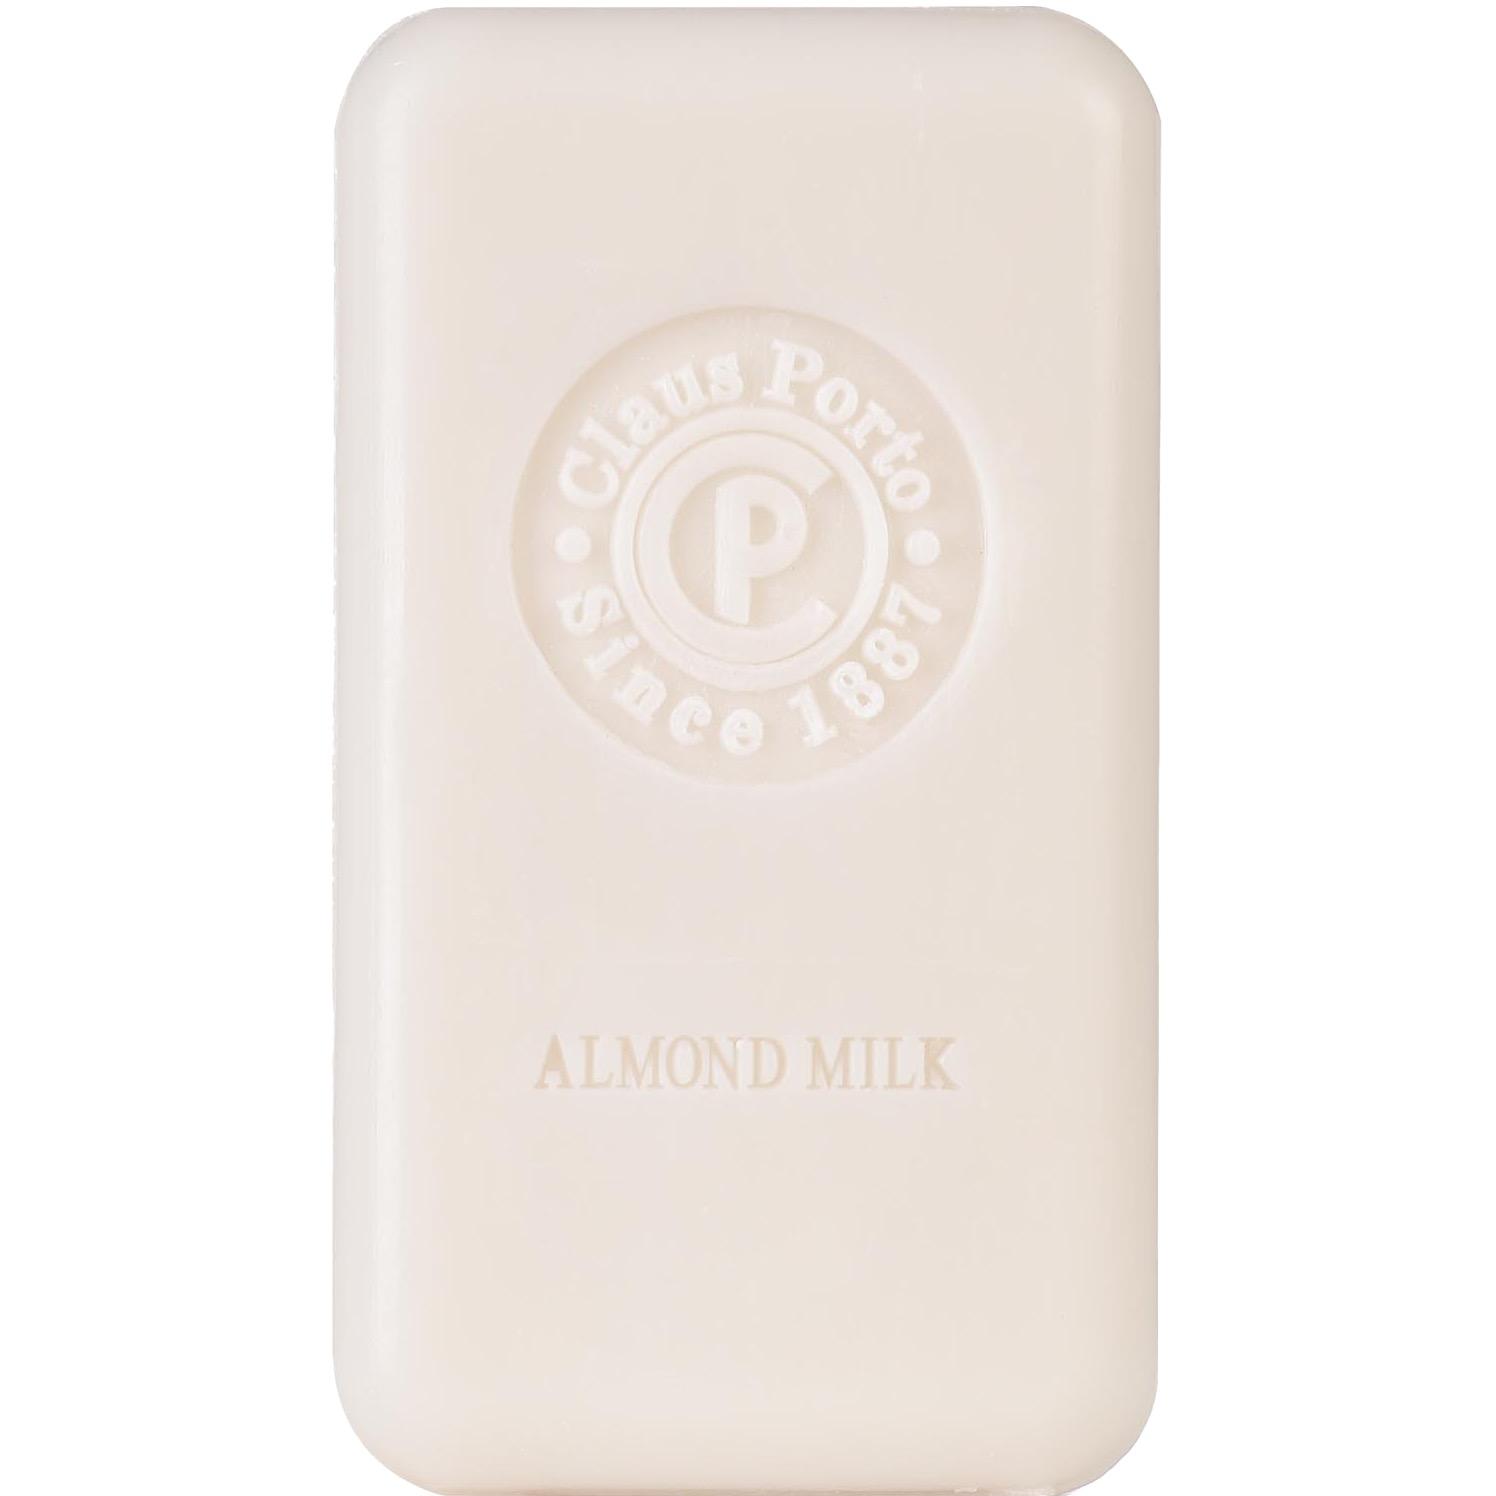 Soap Bar Double - Almond Milk